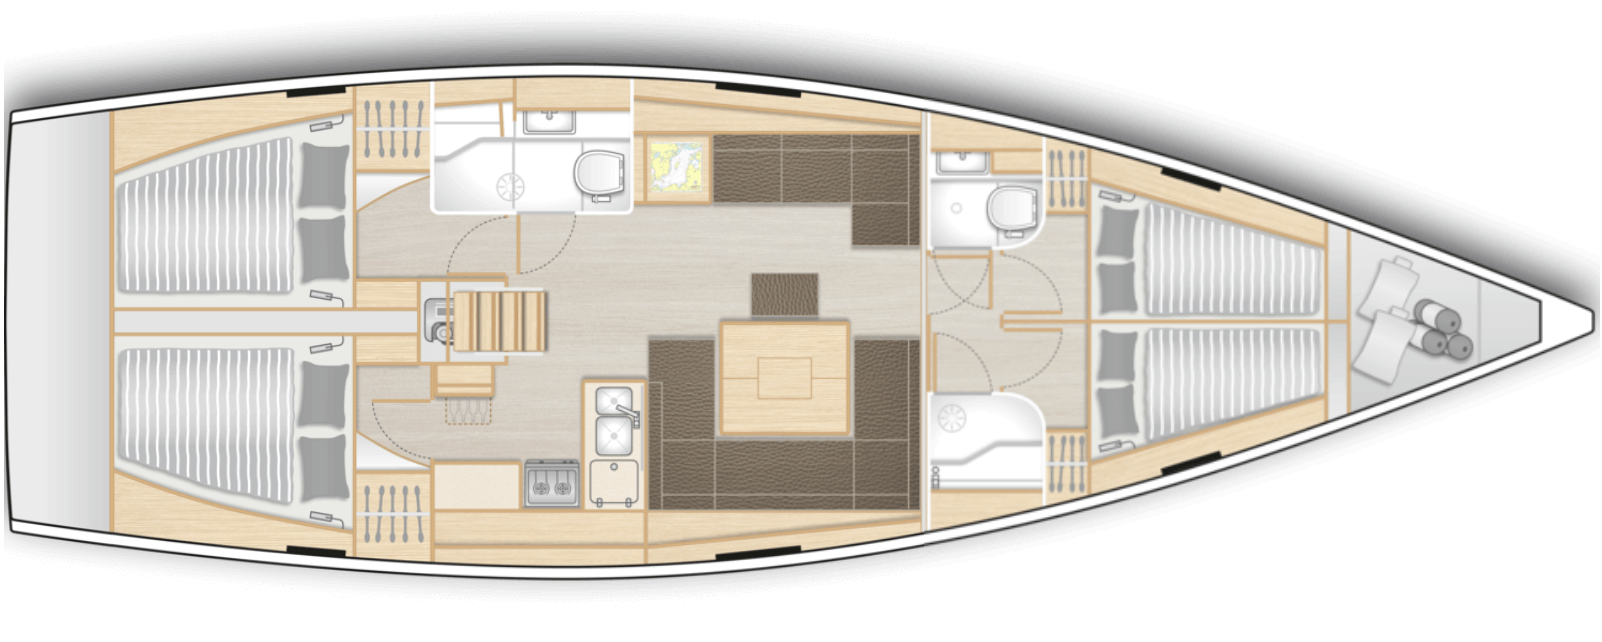 interior-velero-de 11-15-metros-velero-alquiler-croacia-4-camarotes